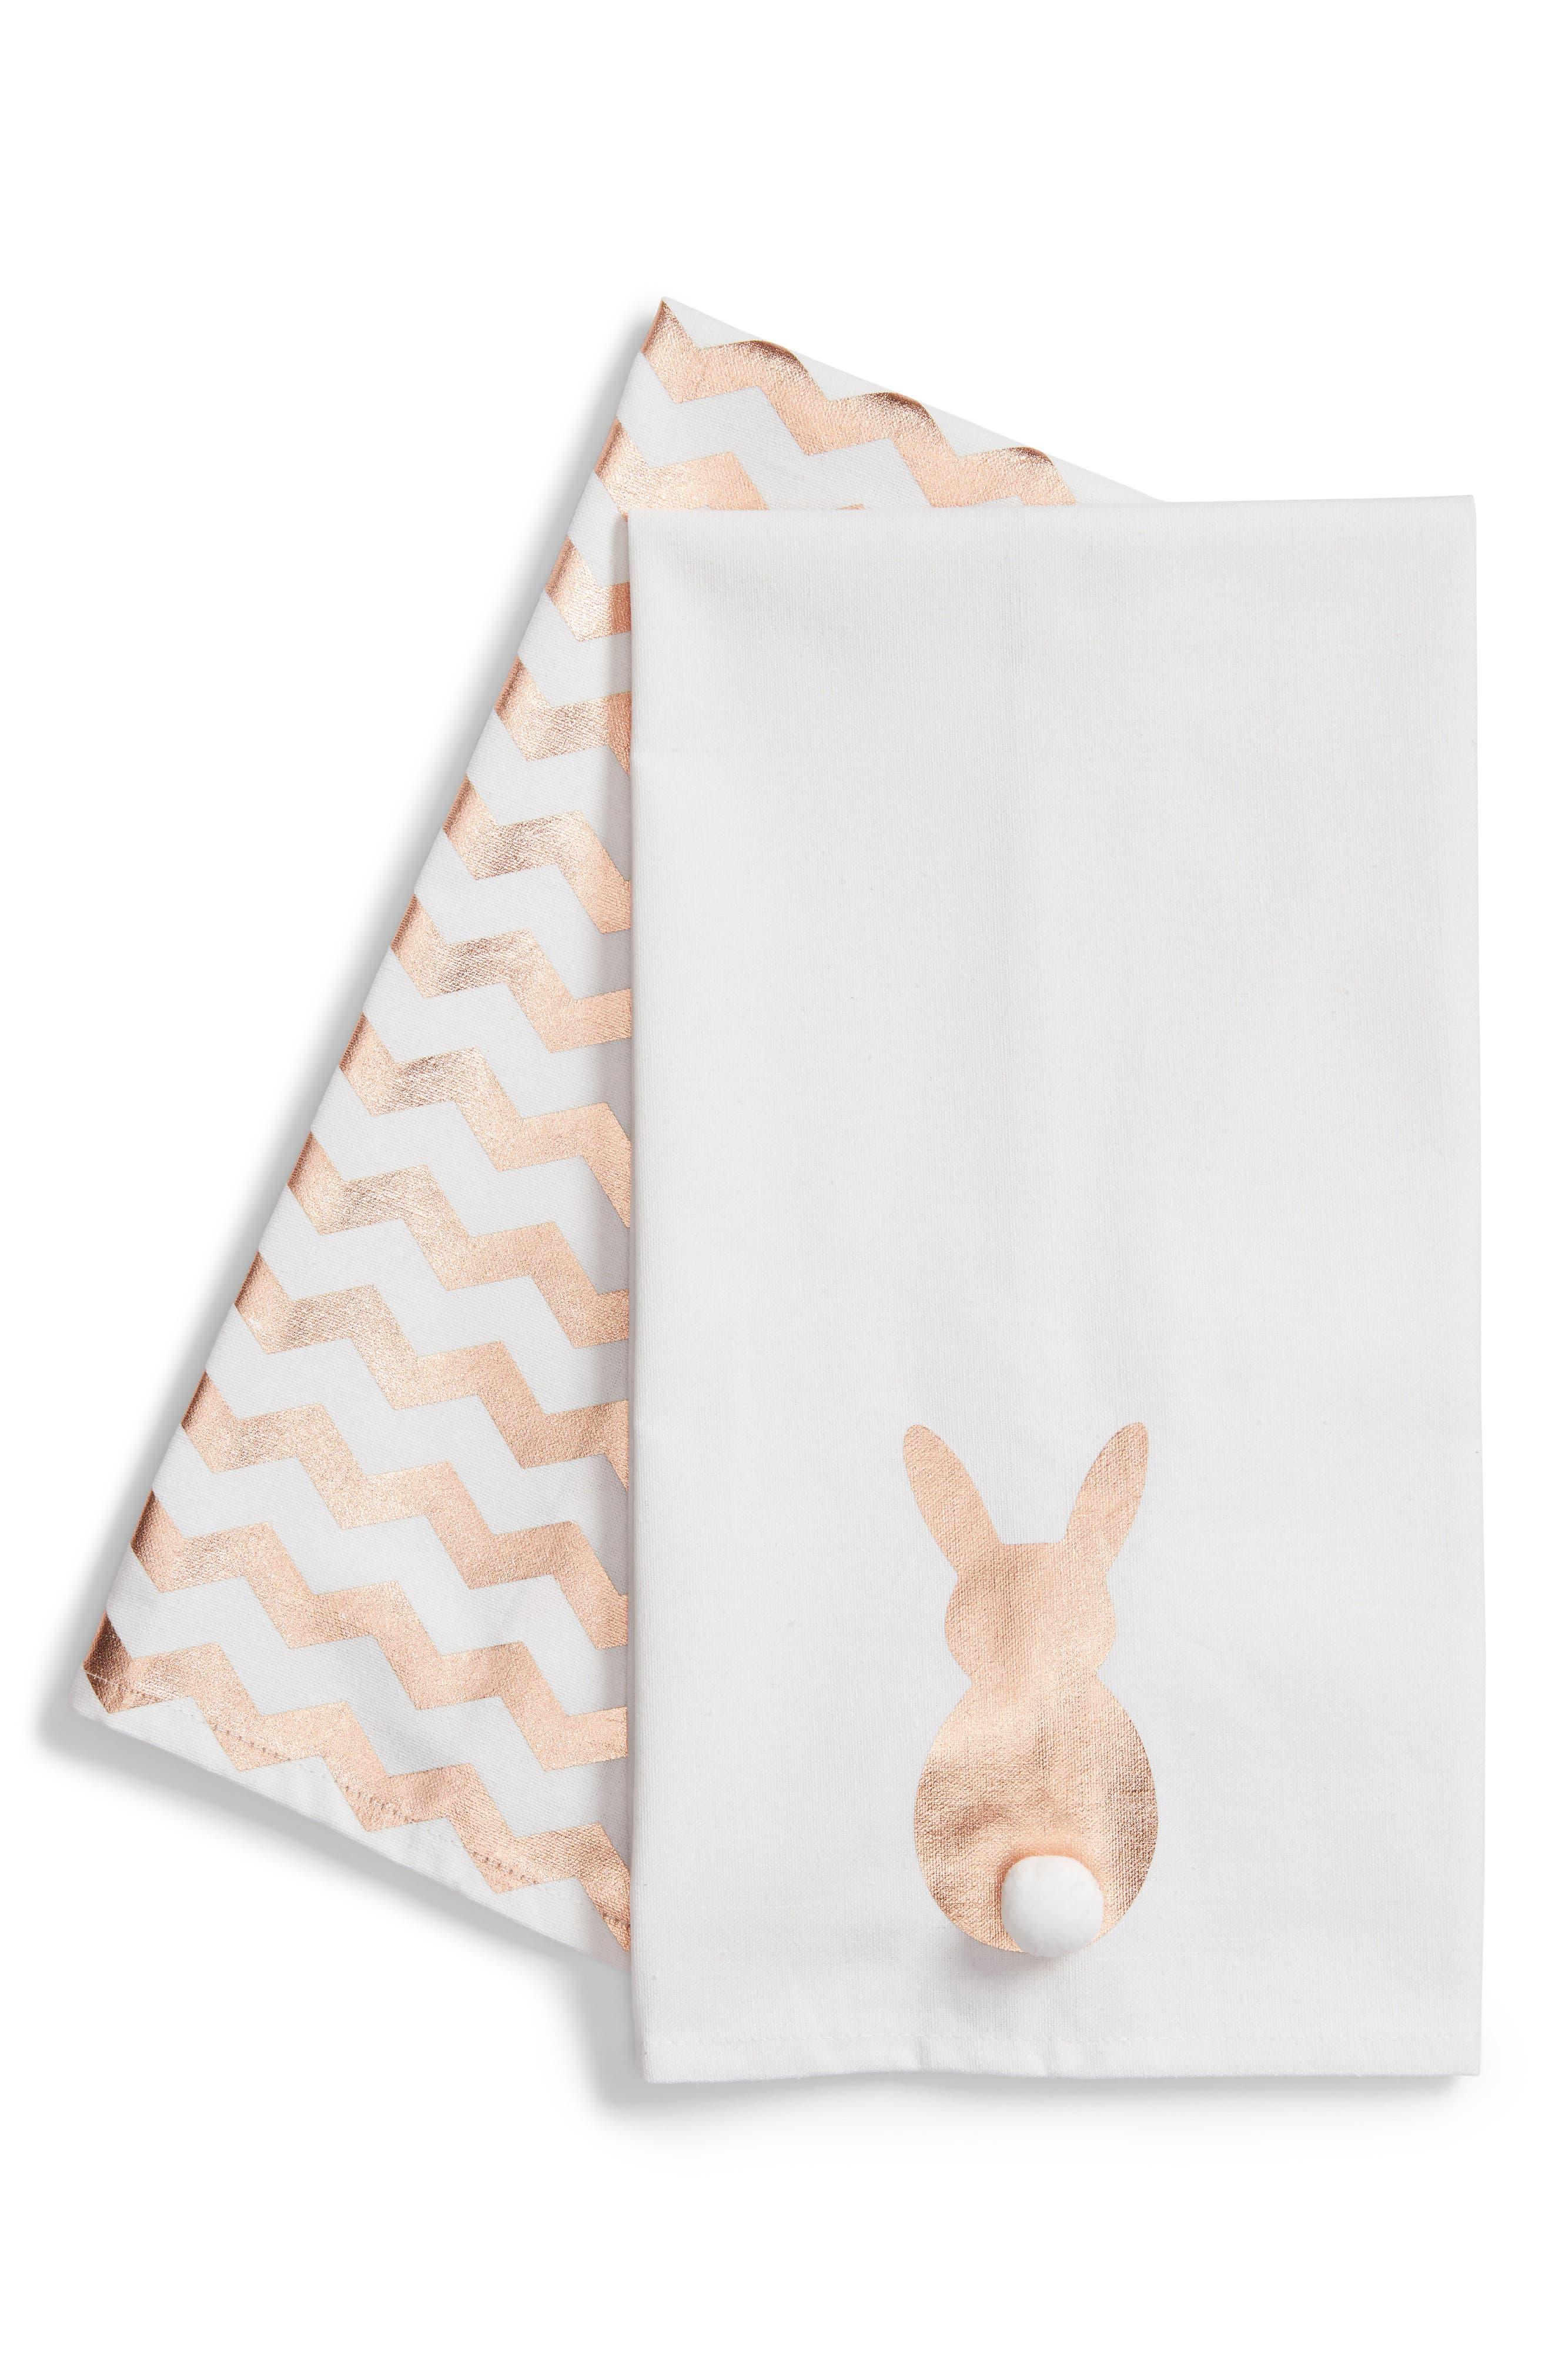 Bunny Set of 2 Dishtowels,                         Main,                         color,